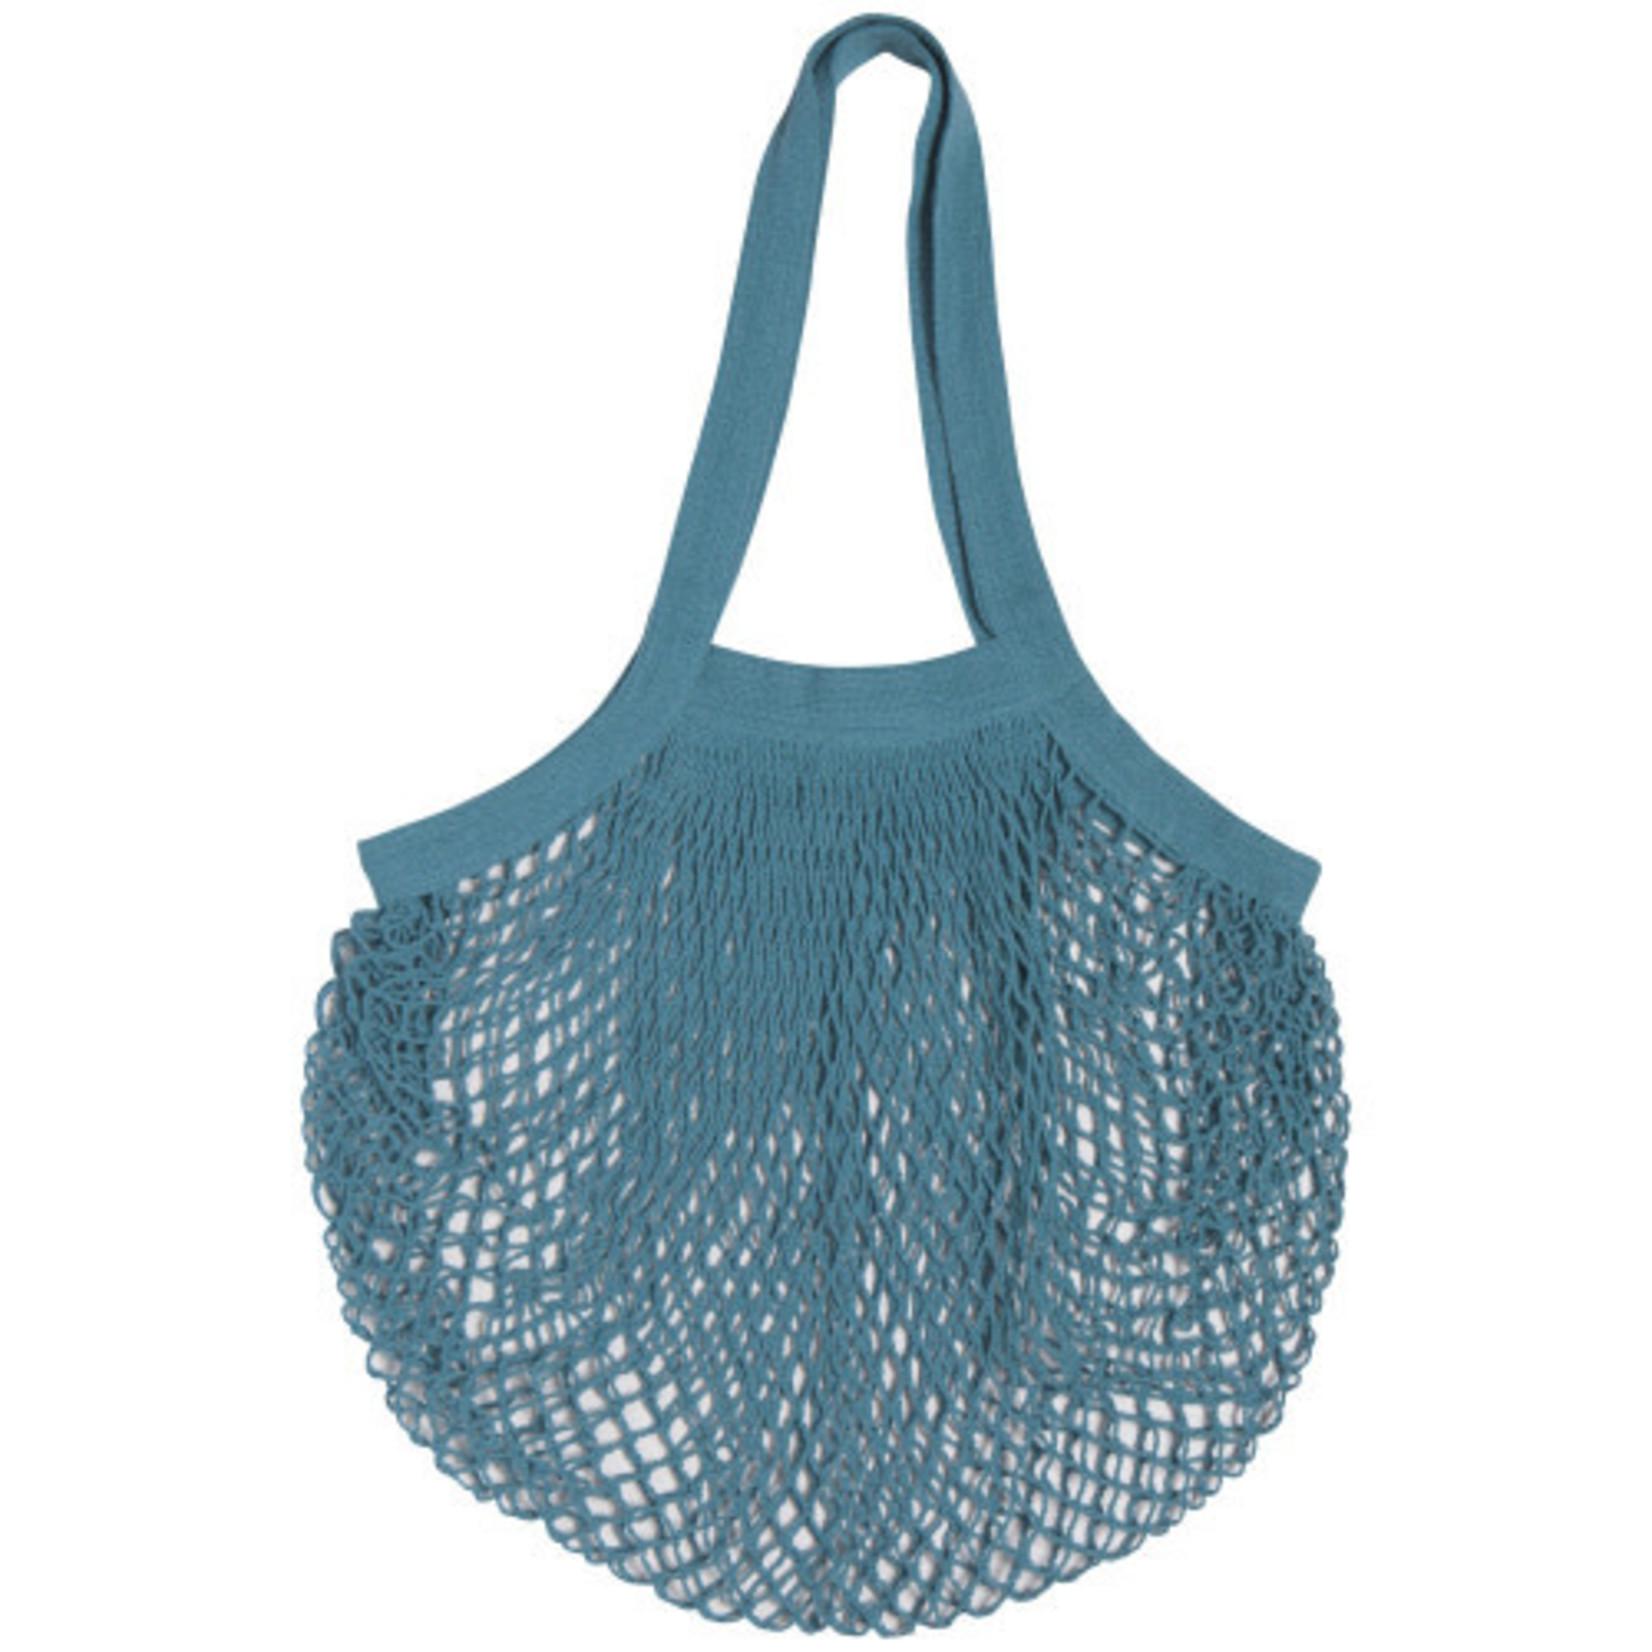 Danica Shopping Bag Le Marche Blue